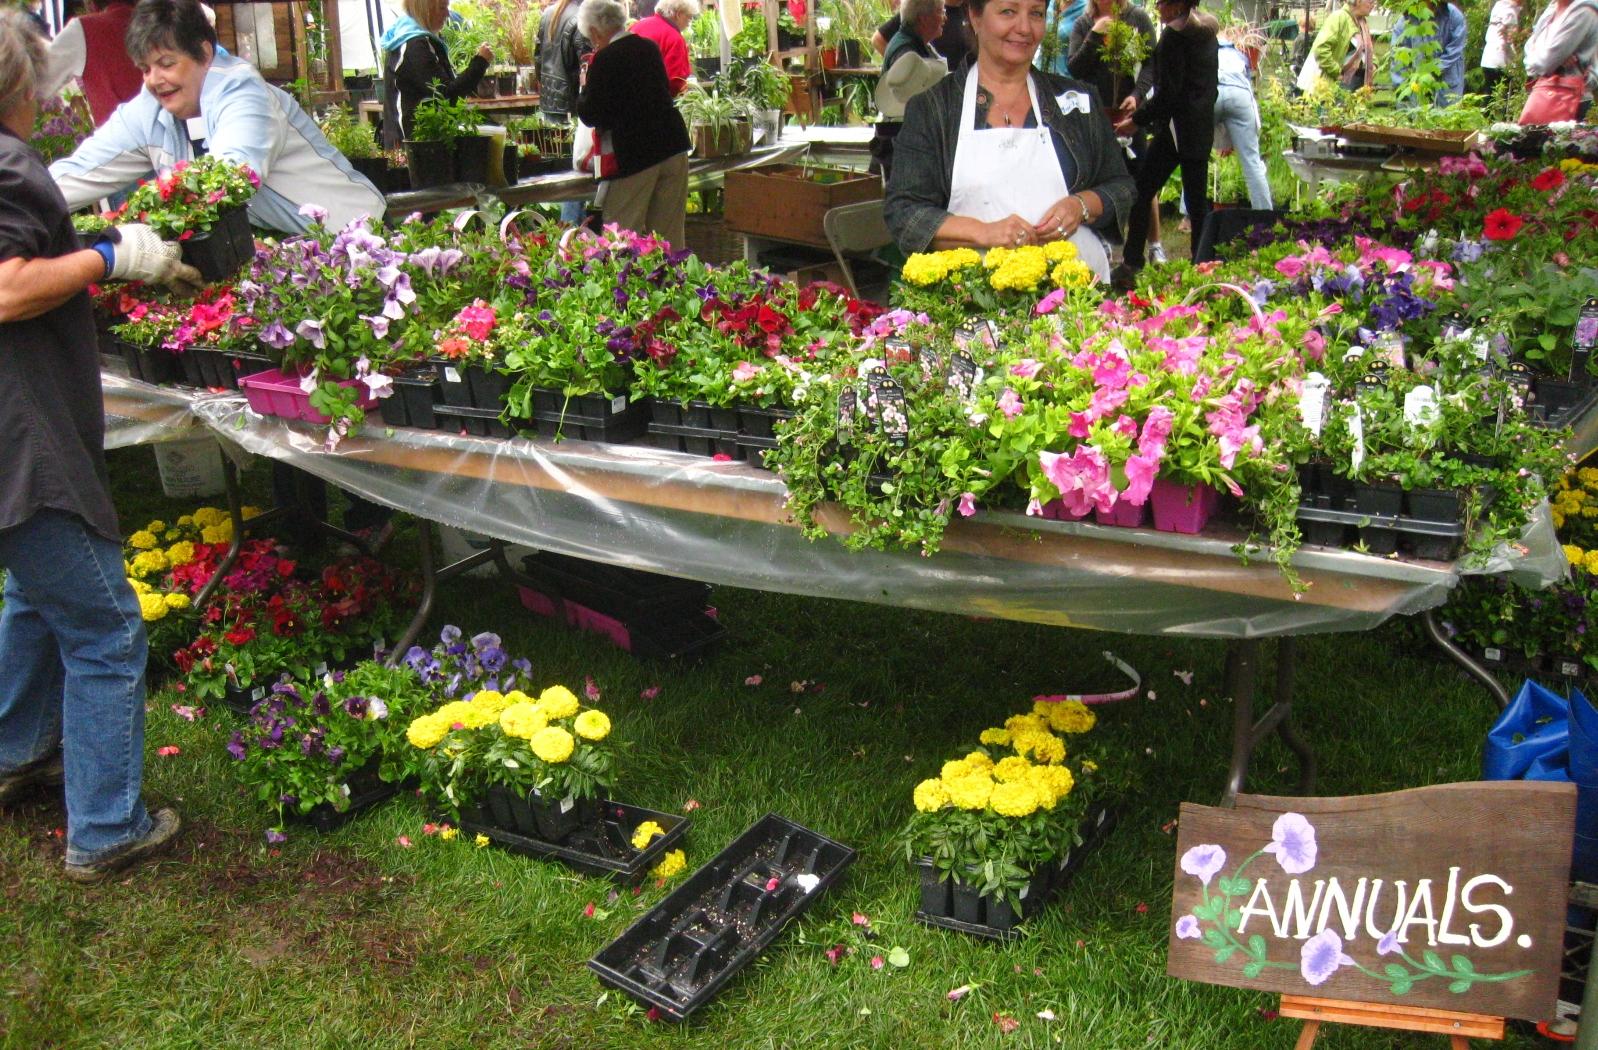 Add colour to your summer garden